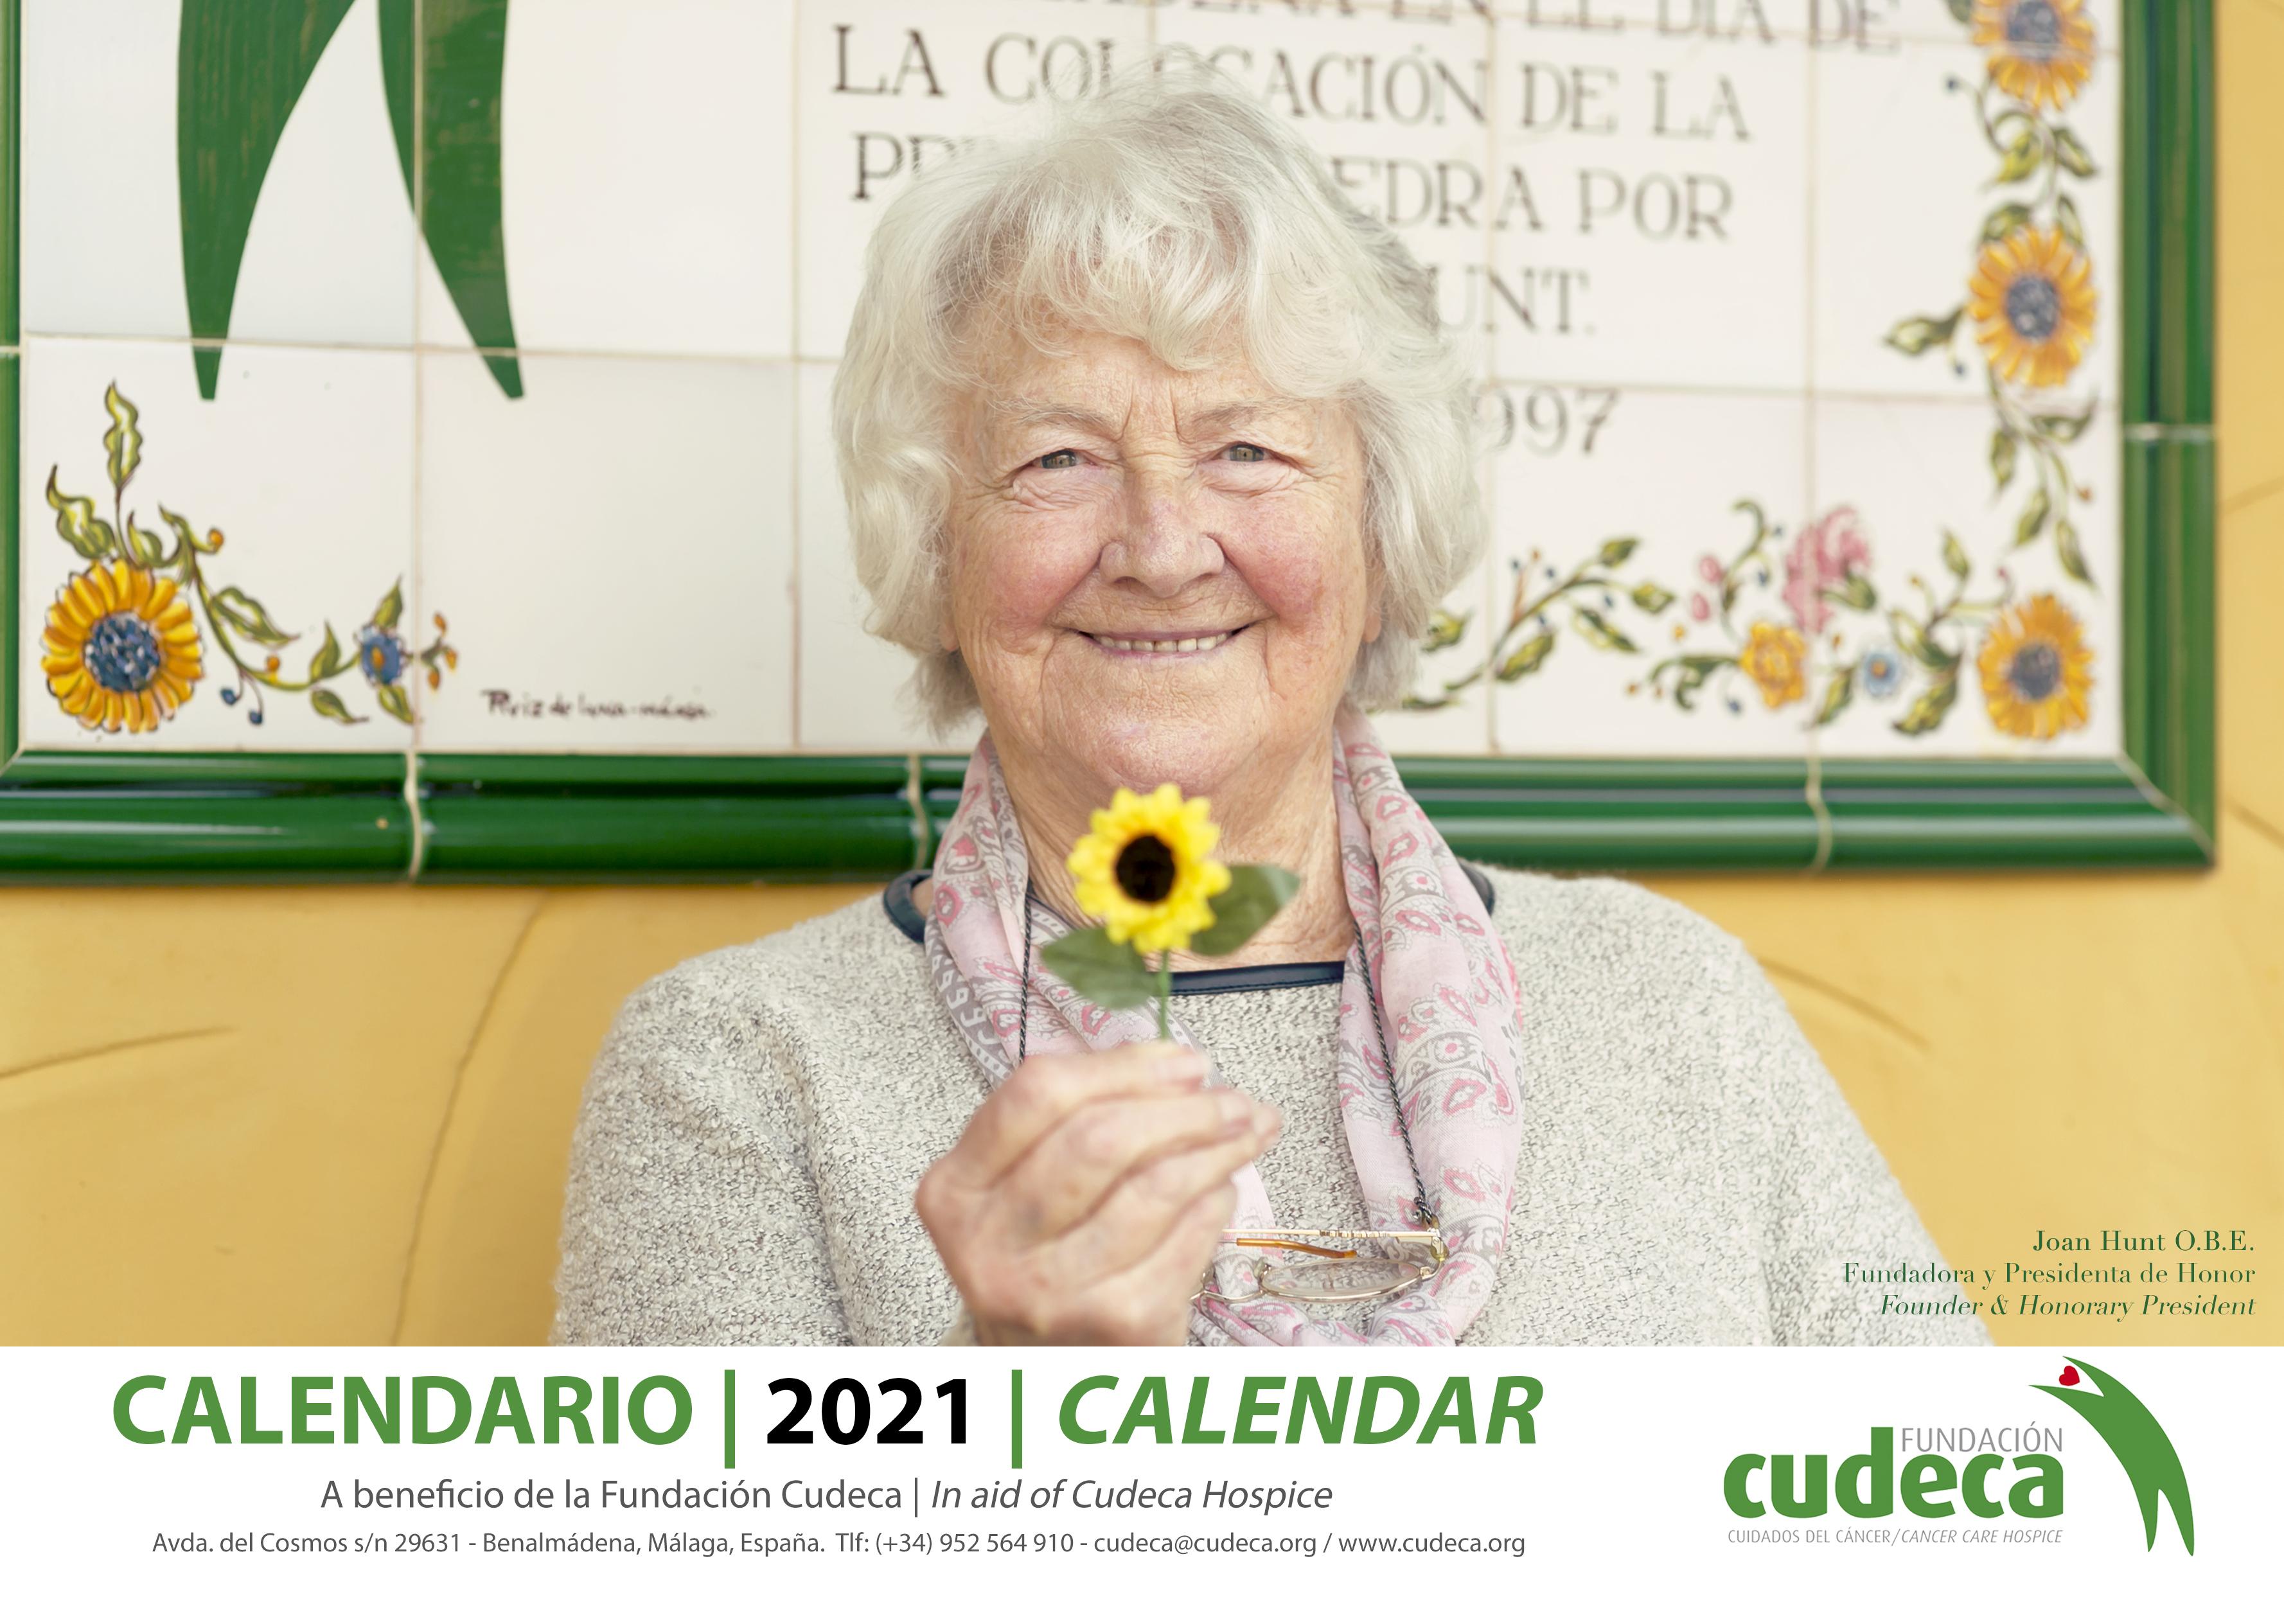 Cudeca Hopice Solidarity Calendar 2021